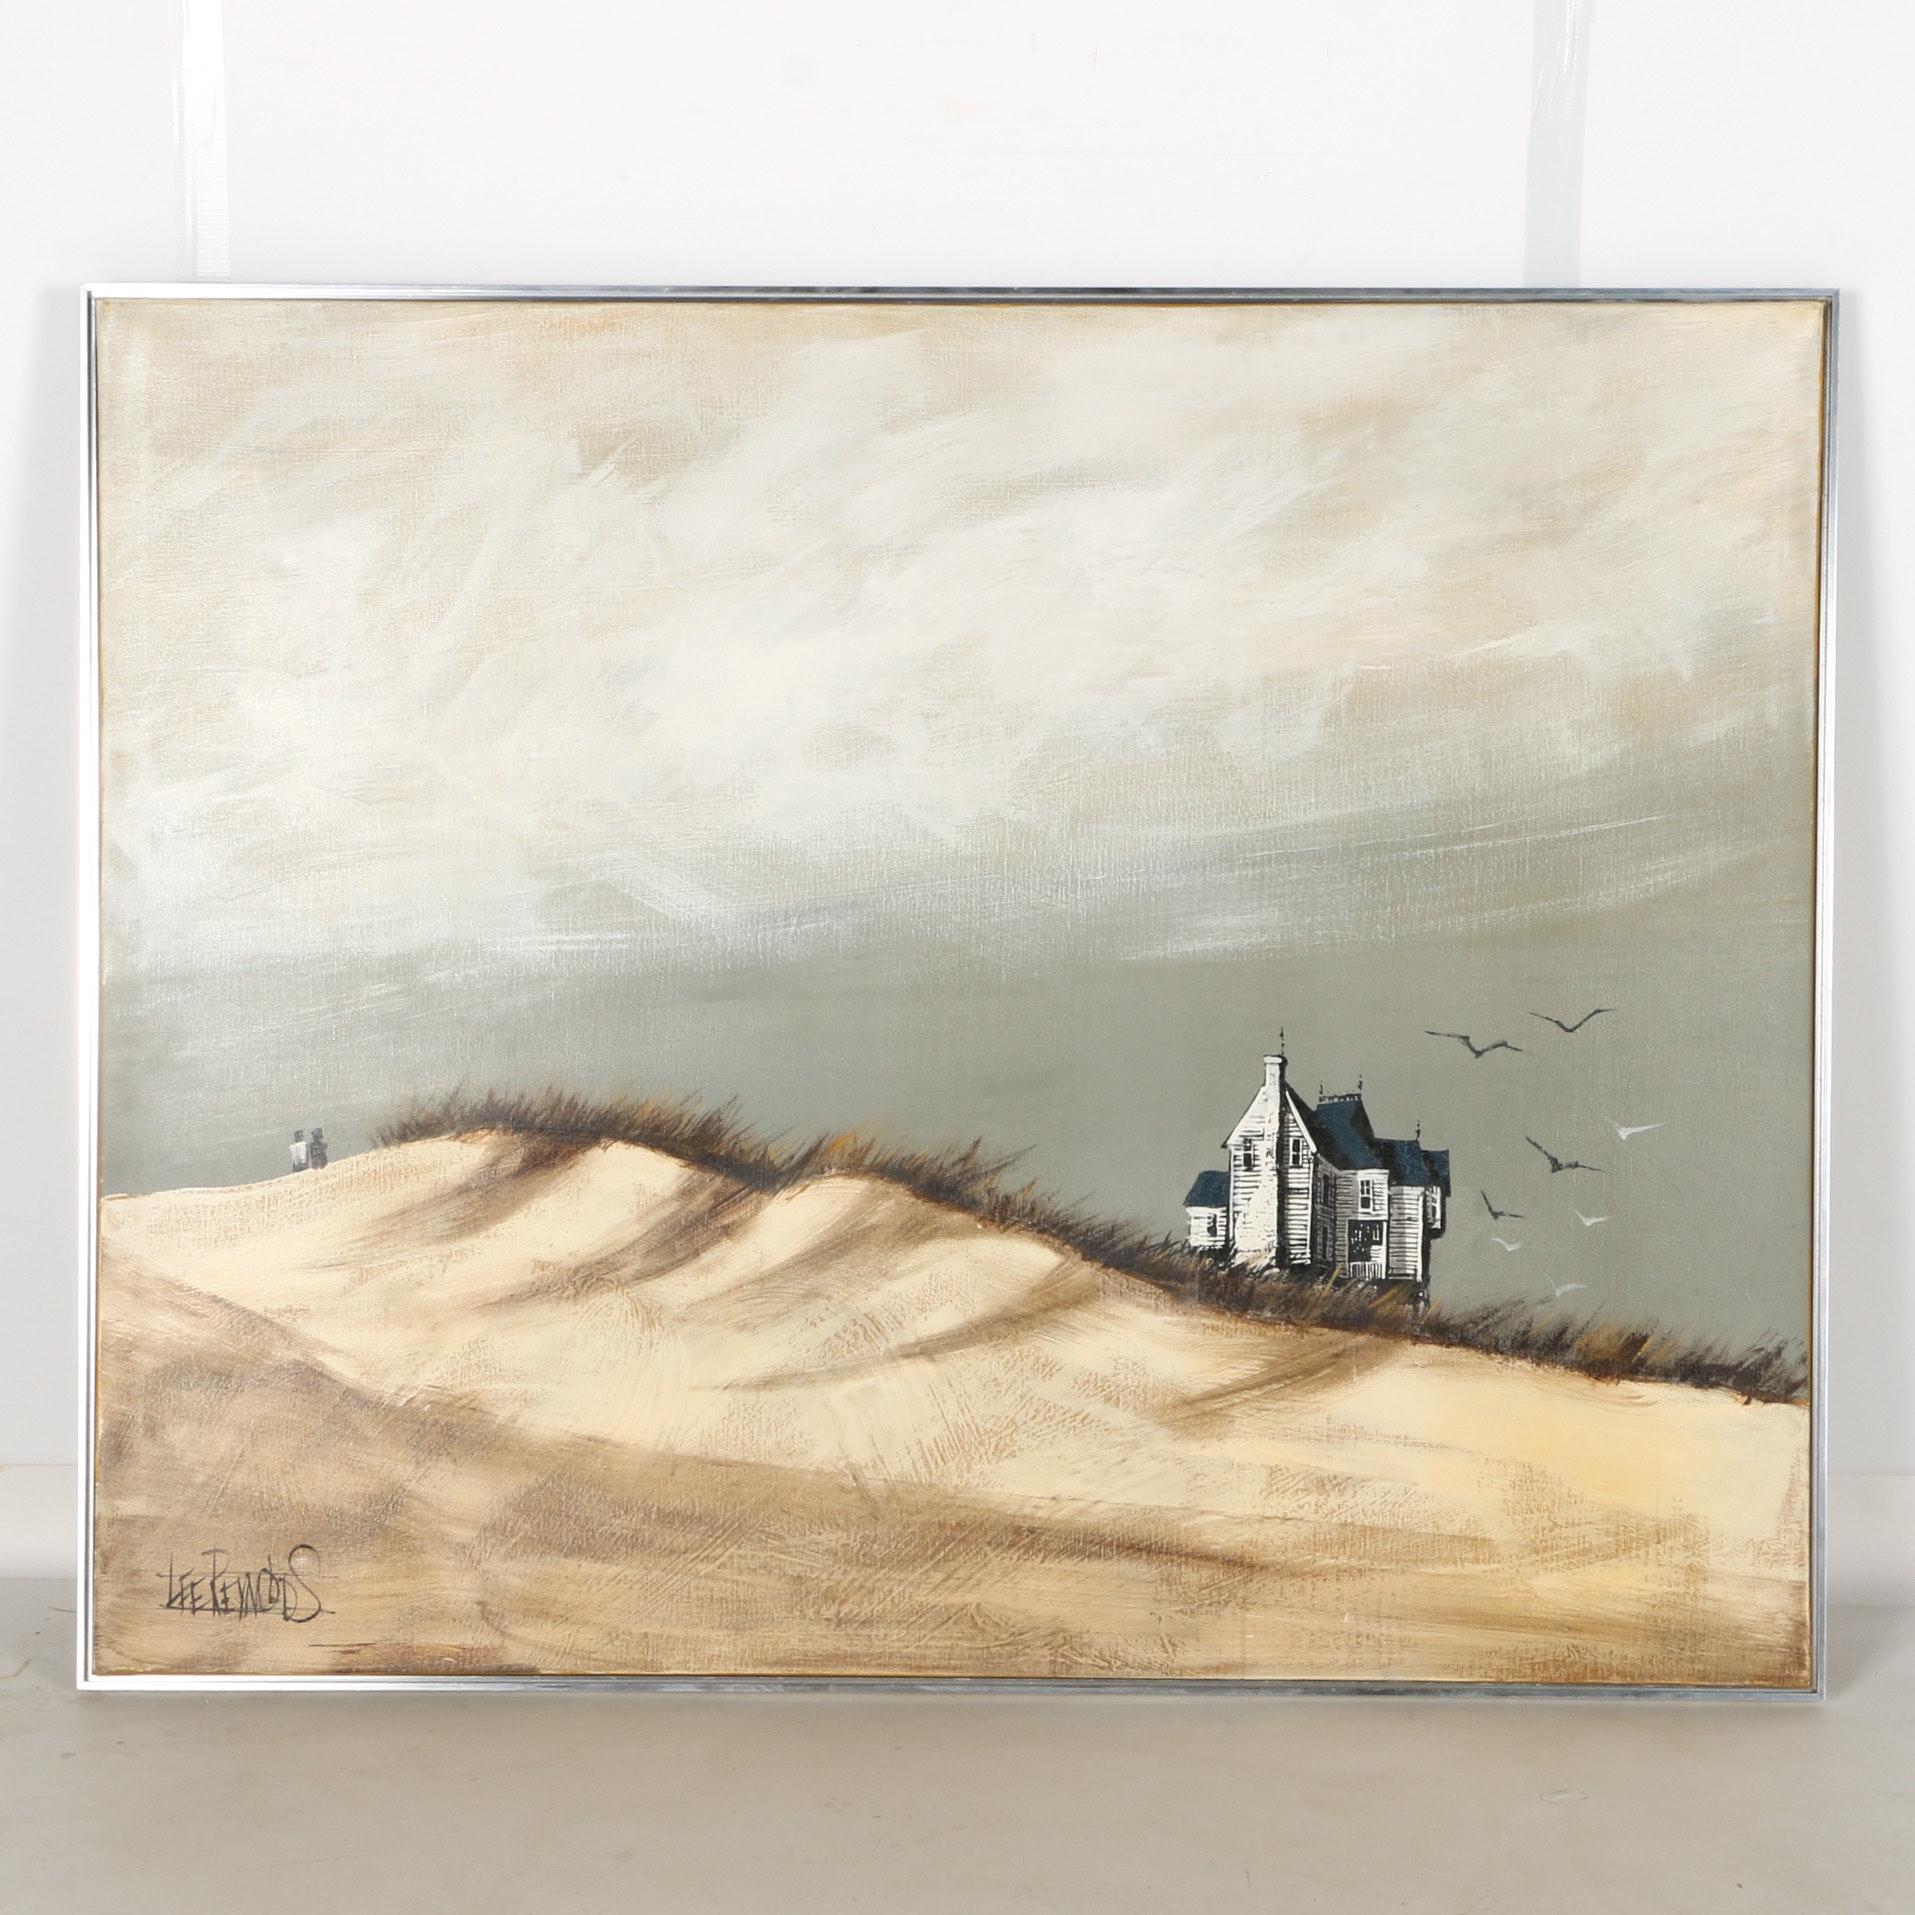 Vanguard Studios Embellished Silkscreen on Canvas